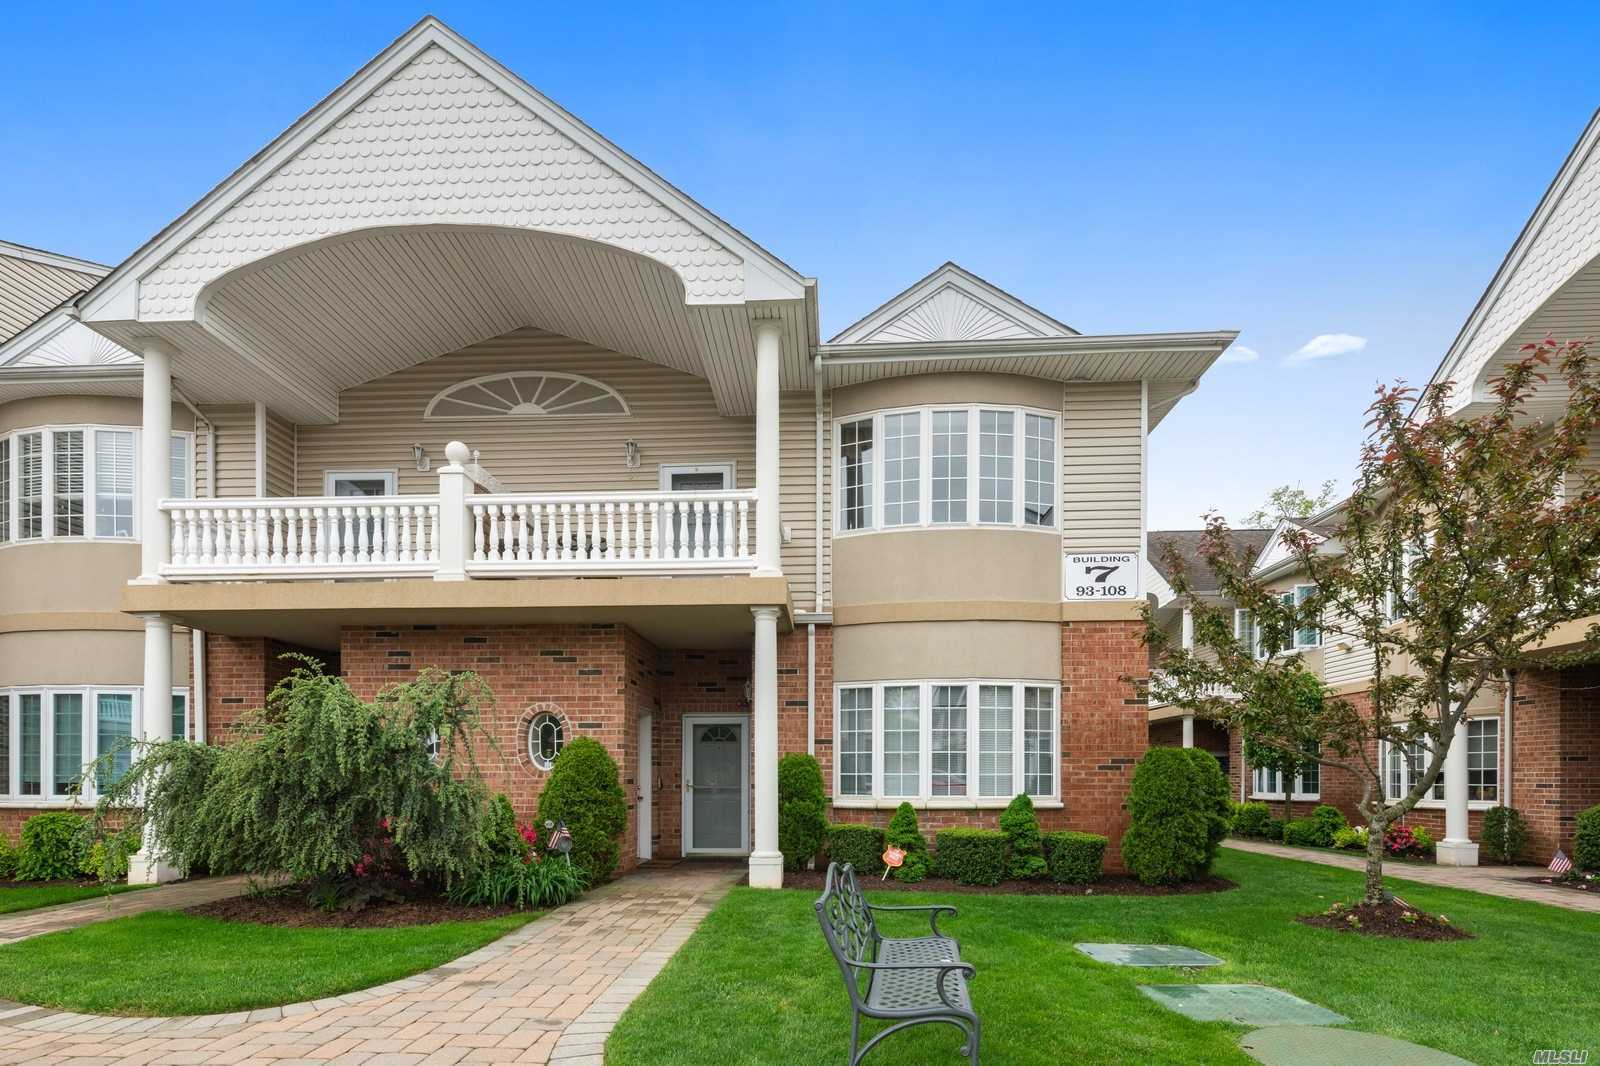 Property for sale at 107 Francesca Way, Amityville NY 11701, Amityville,  New York 11701